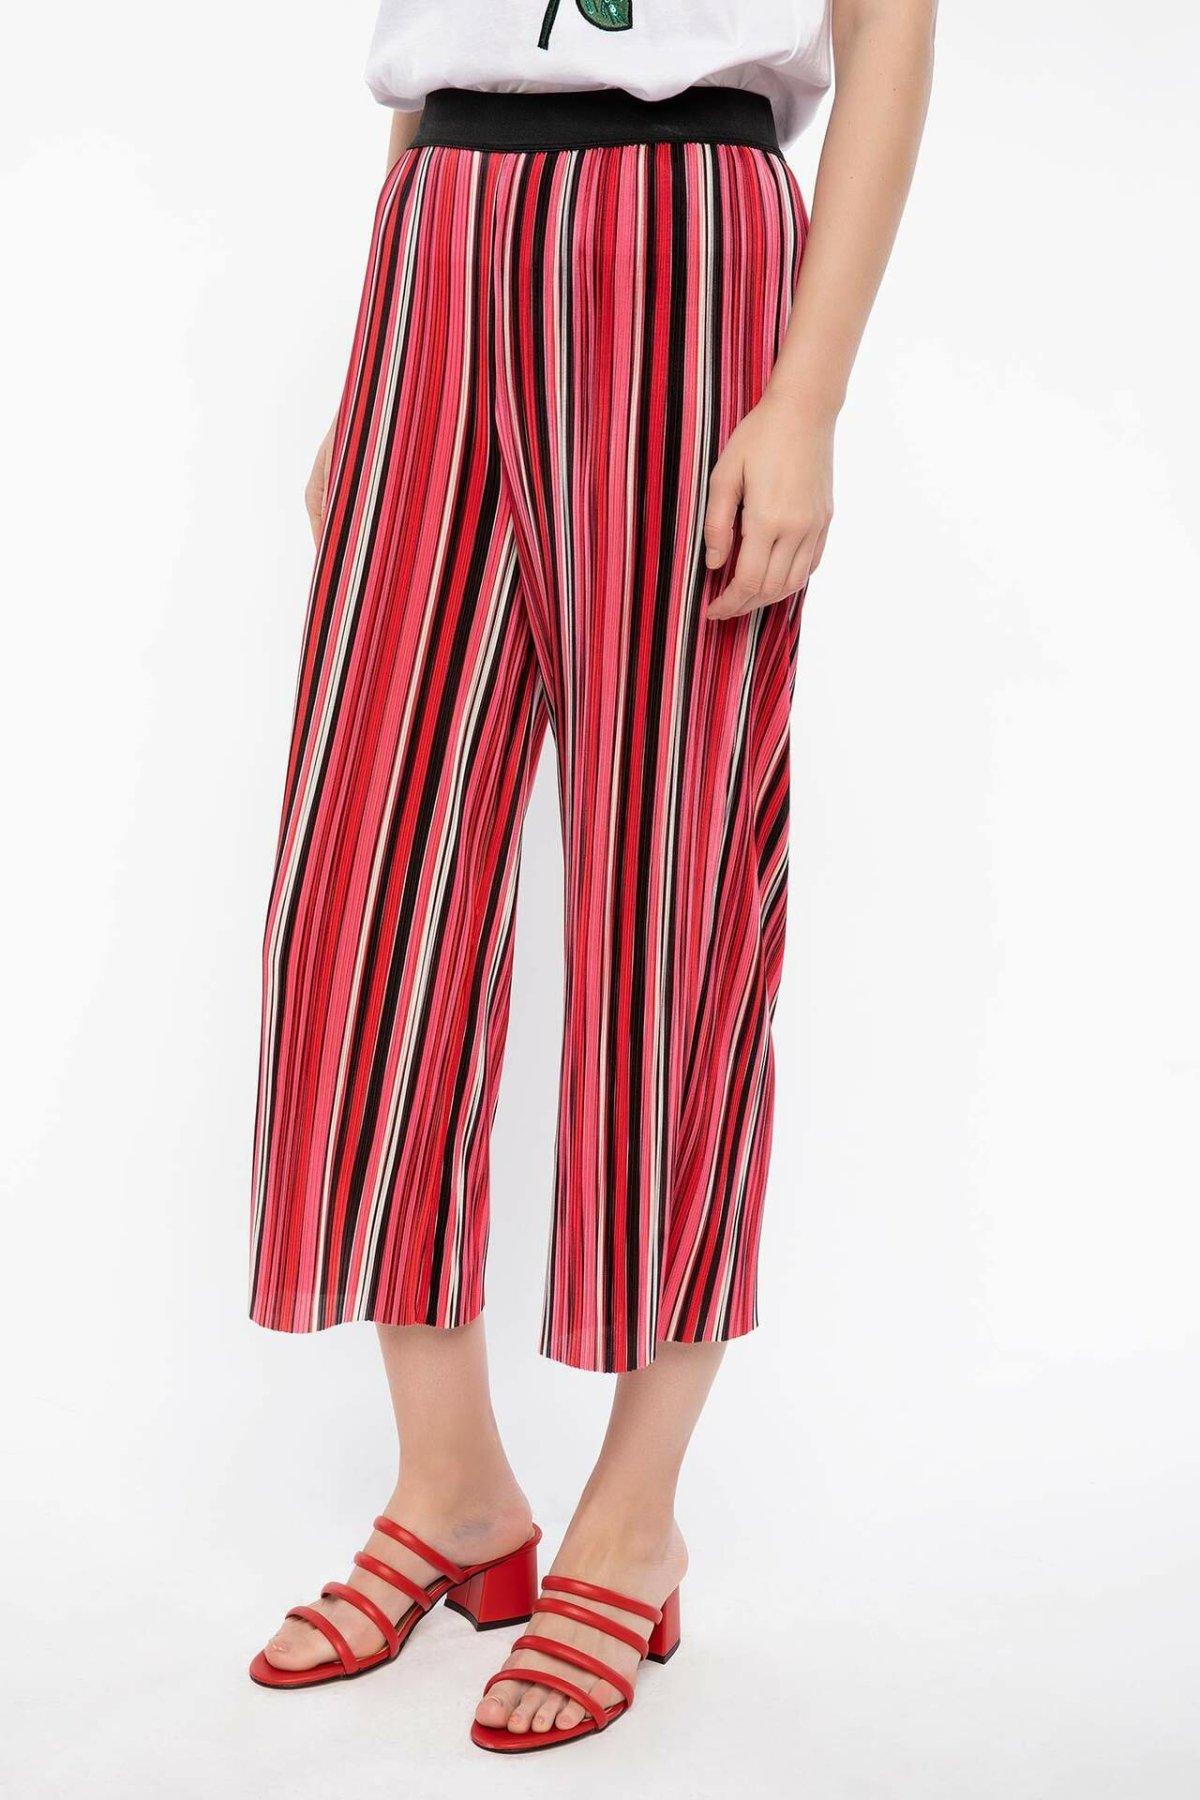 DeFacto Fashion Women Striped Trousers Female Casual Comfort Crop Pants High Qualilty Loose Wide Leg Pant Female - J5994AZ18HS